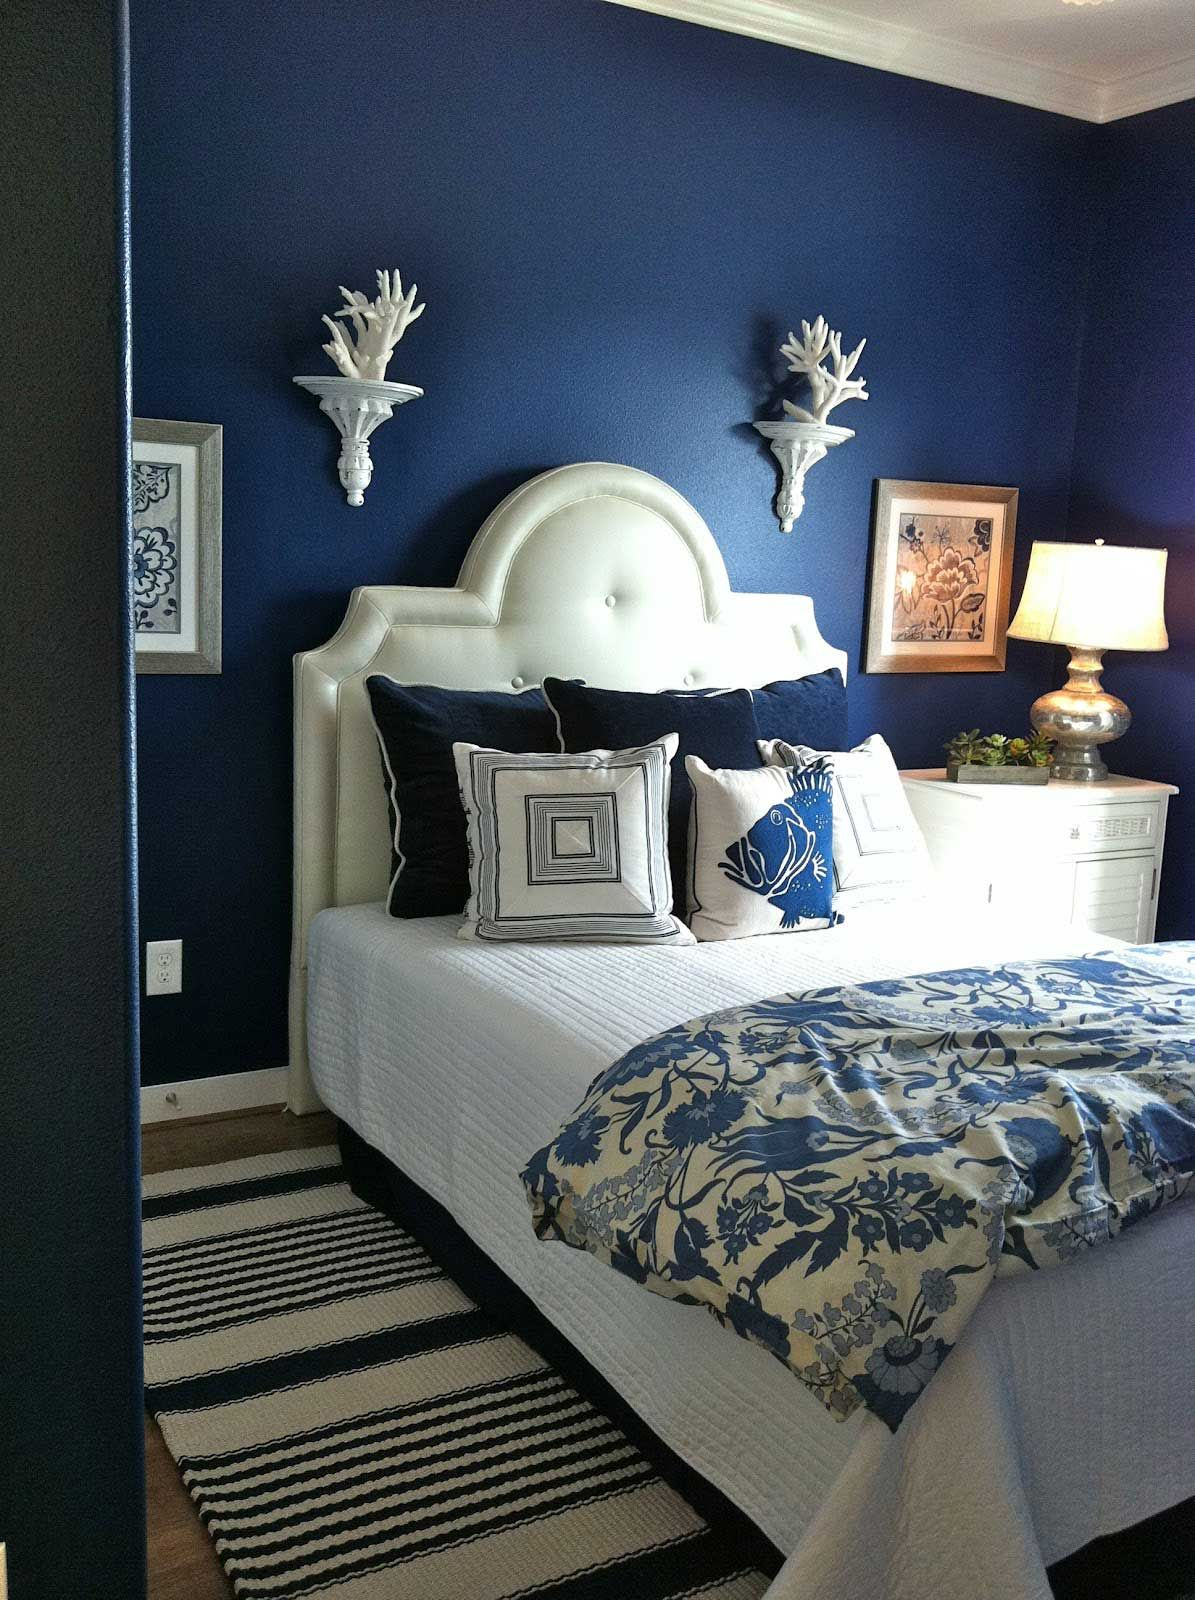 Dark Blue Bedroom Design Blue Bedroom Design Blue Bedroom Walls